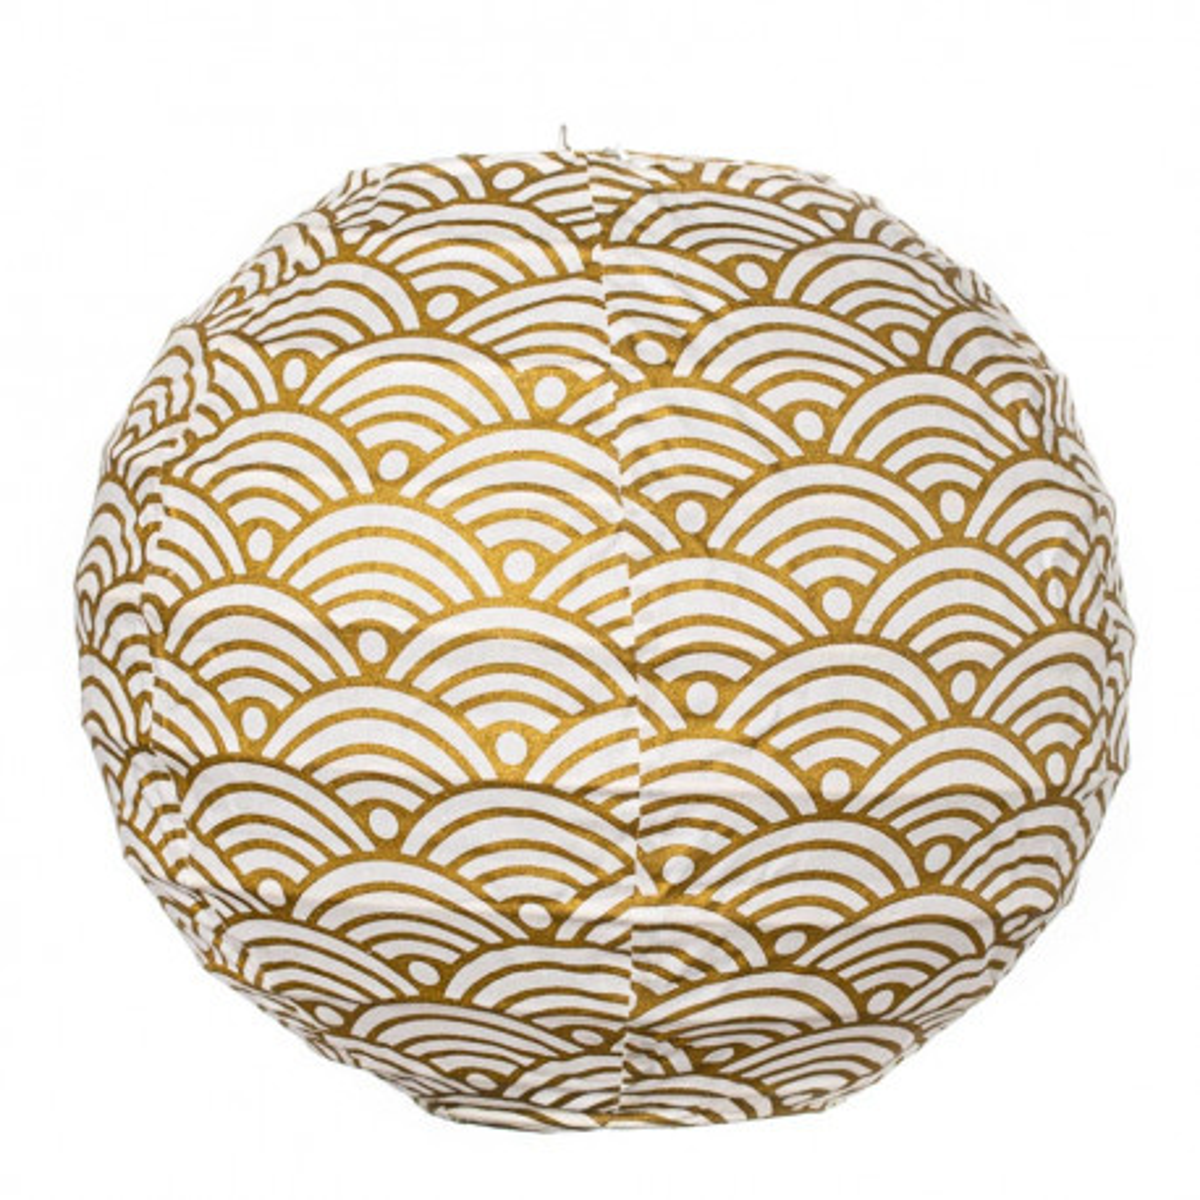 Lampion tissu boule japonaise mini rond nami or